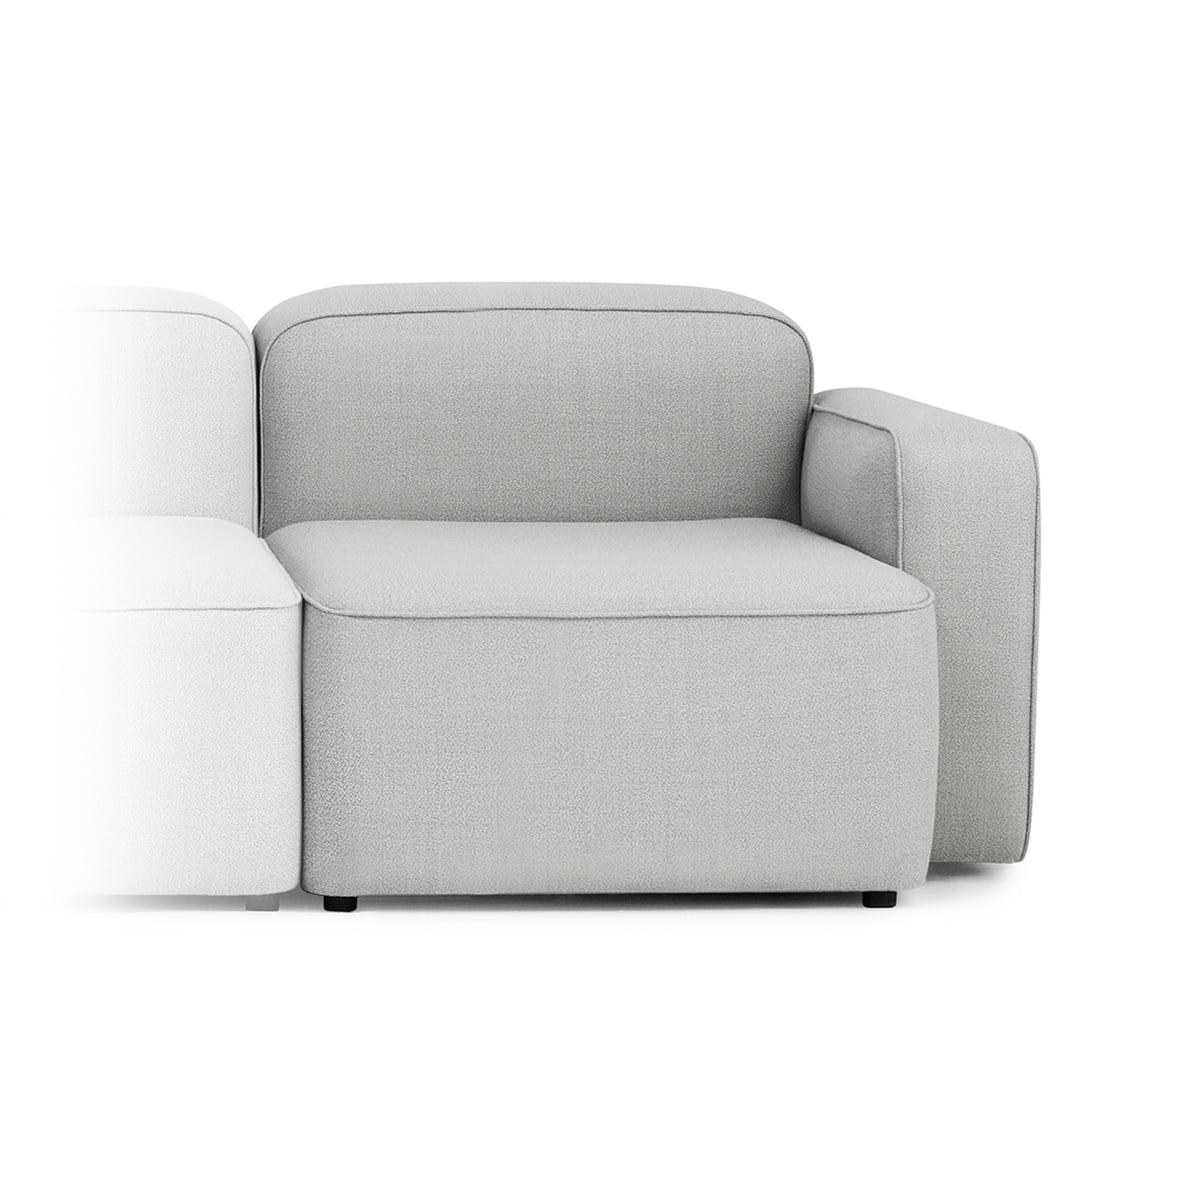 module rope sofa narrow normann copenhagen boutique. Black Bedroom Furniture Sets. Home Design Ideas